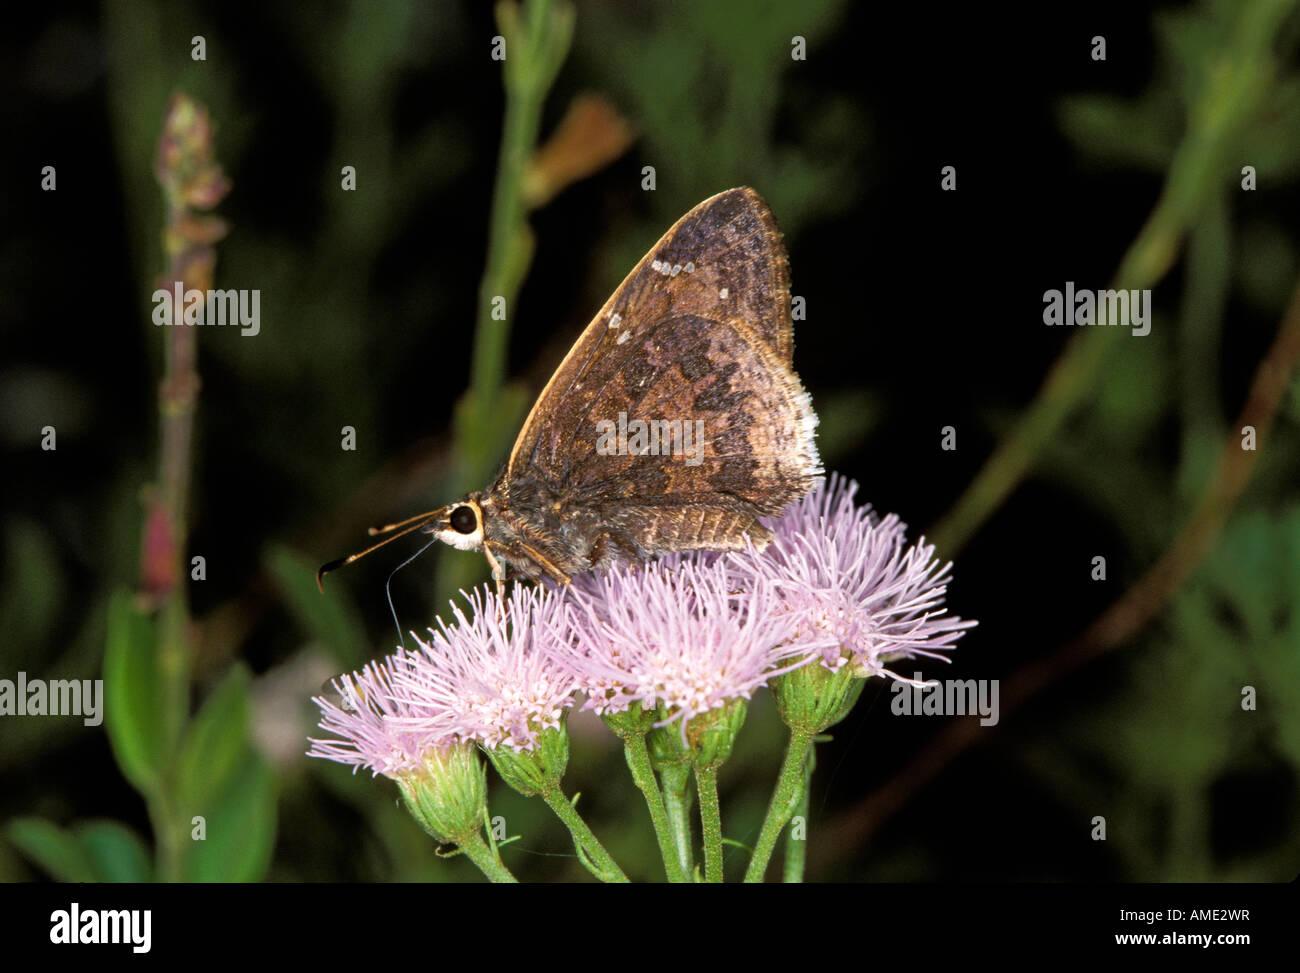 Sưu tập Bộ cánh vẩy 2 - Page 38 Gold-costa-skipper-cogia-caicus-patagonia-harshaw-canyon-arizona-united-AME2WR